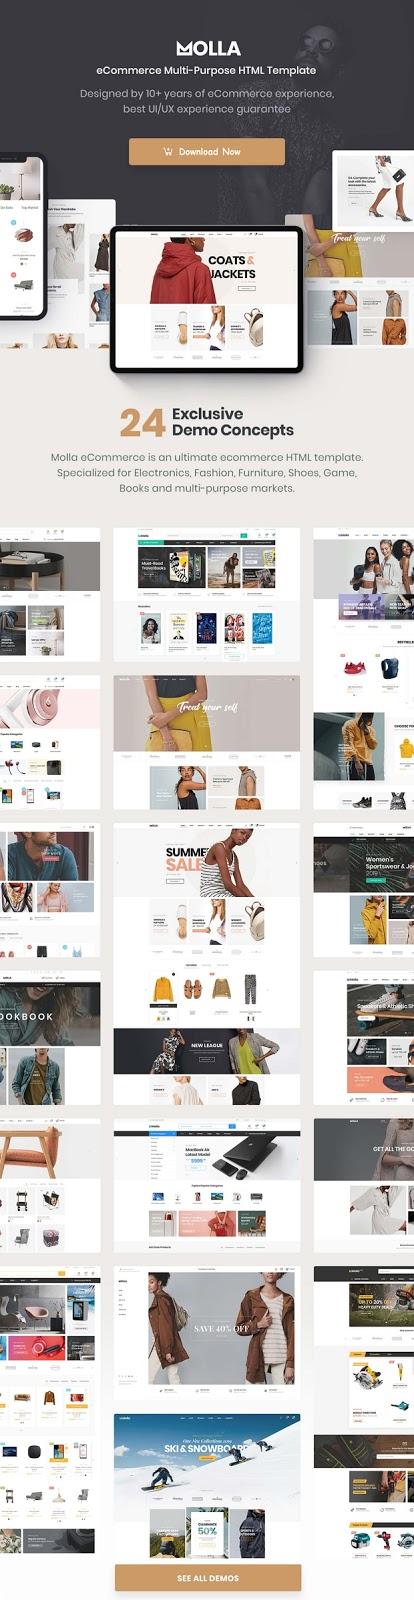 Molla - Multipurpose eCommerce HTML5 Template